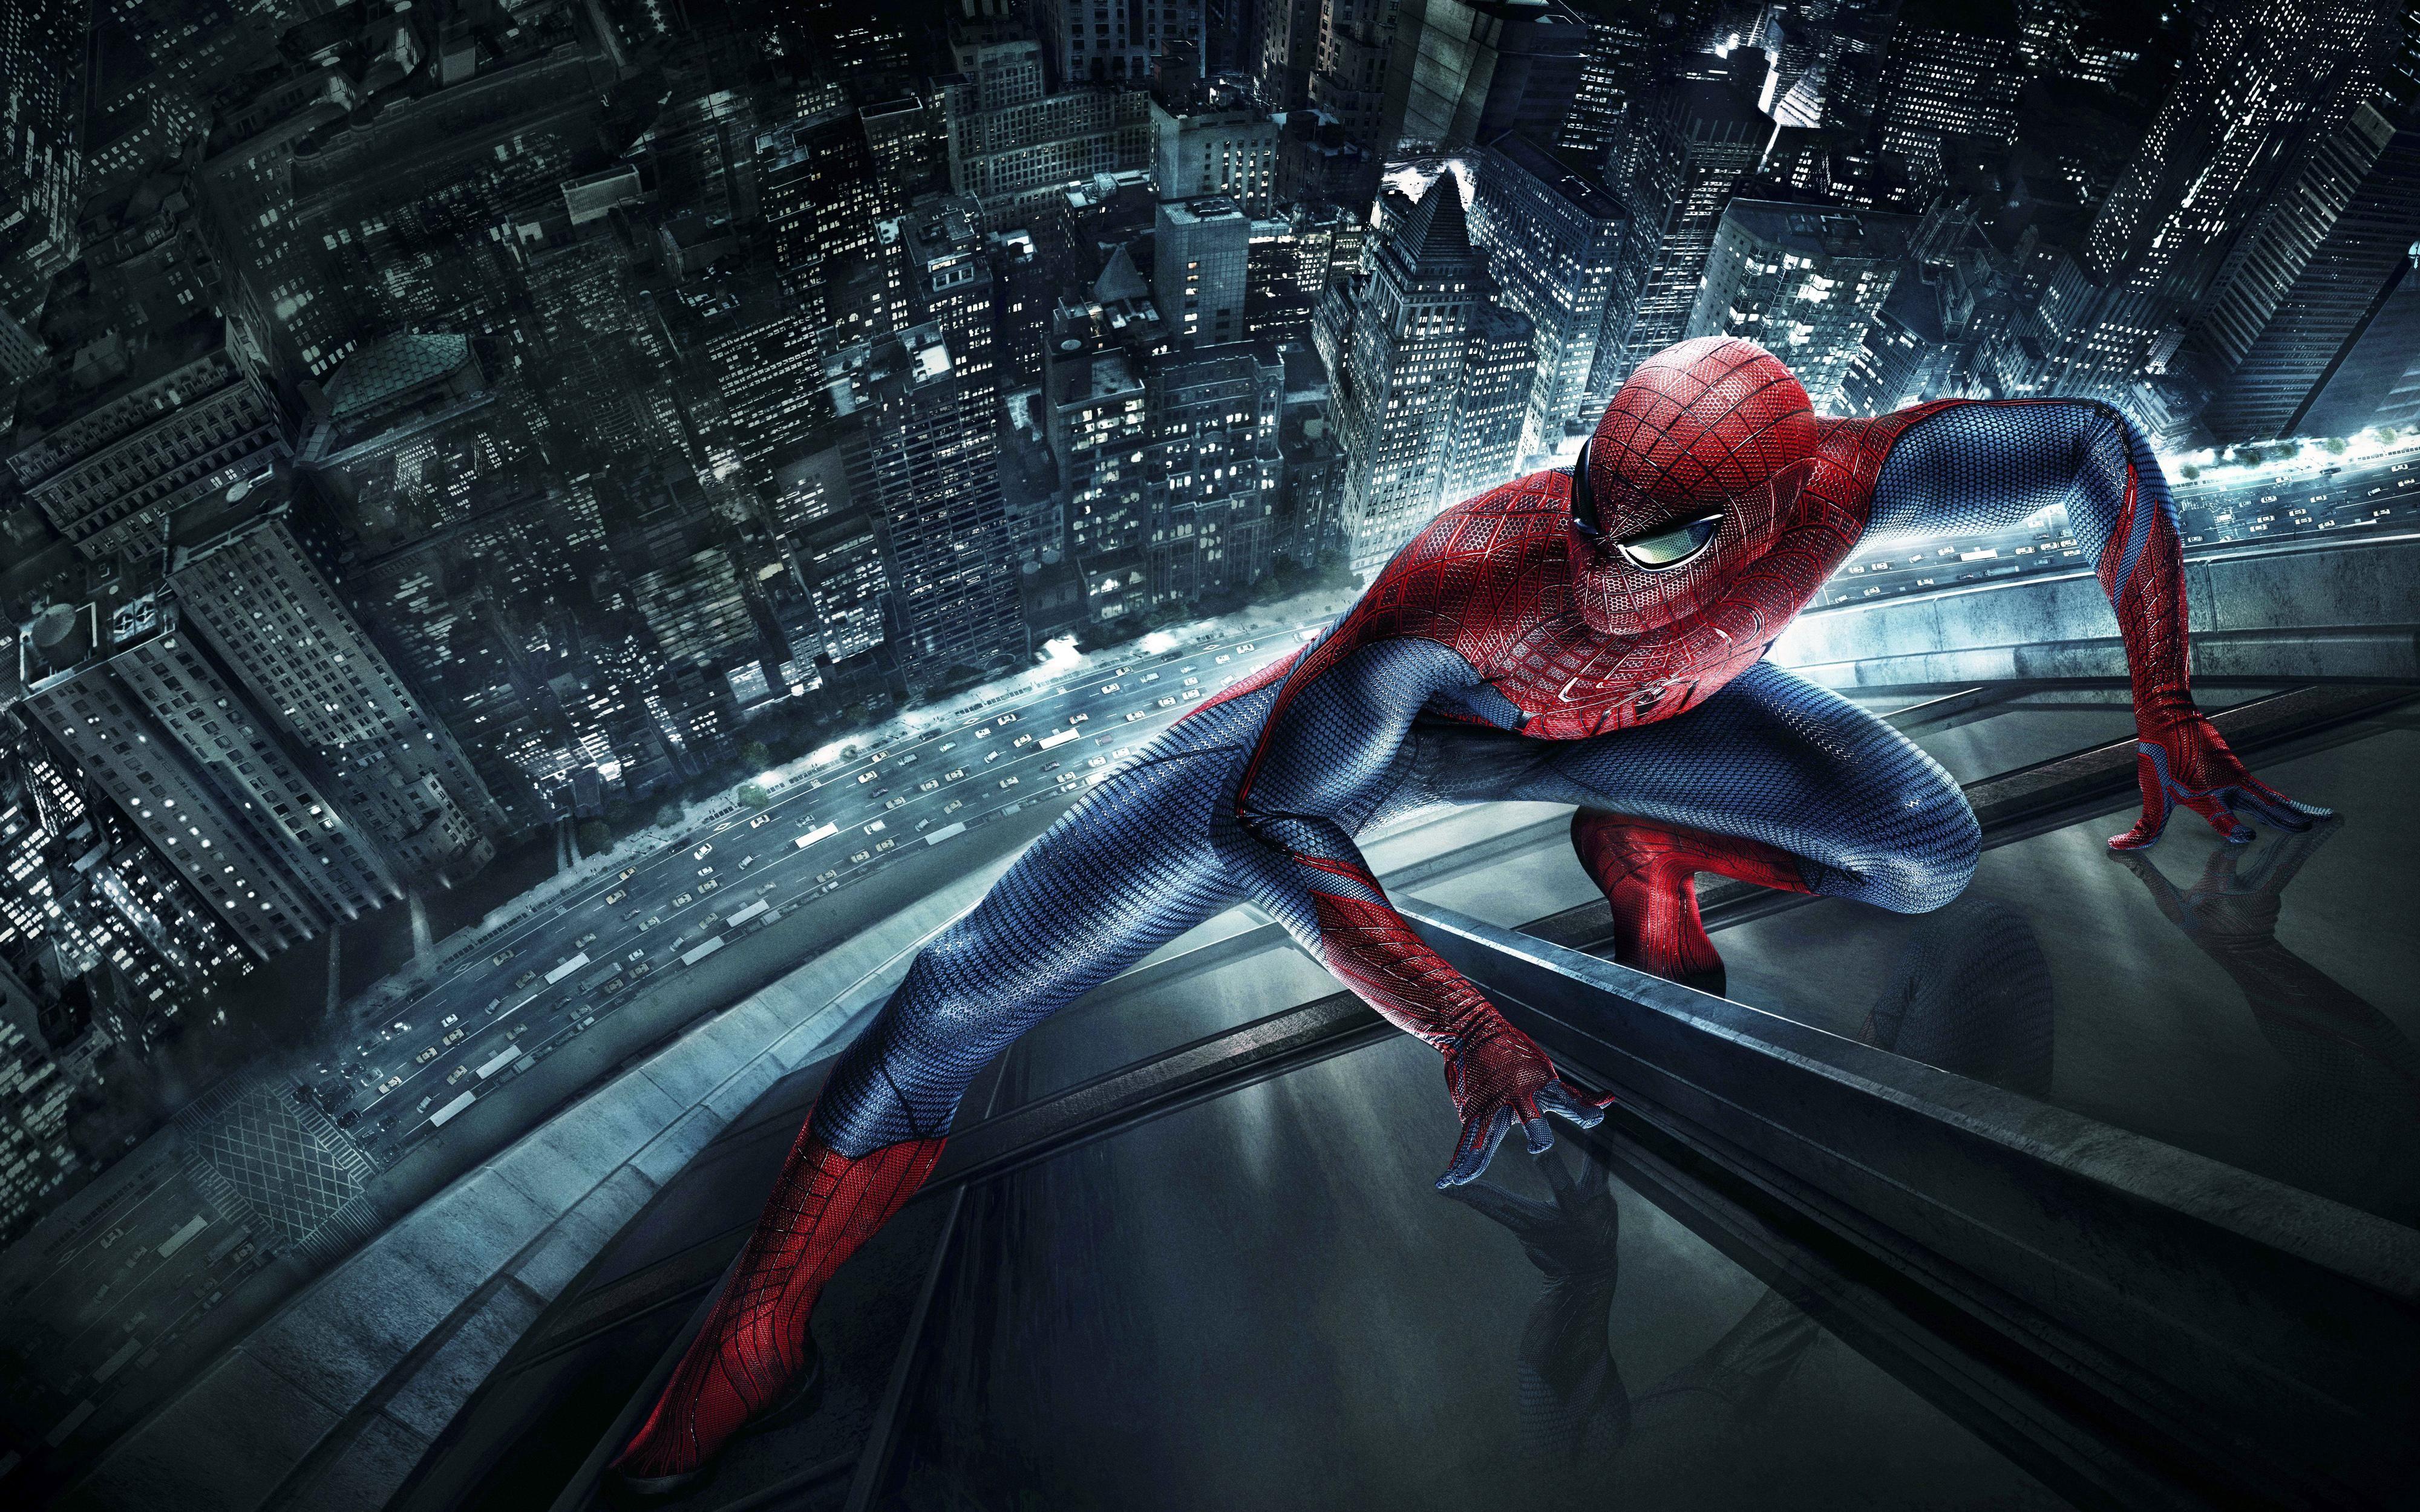 Spiderman 4k Hd Superheroes 4k Wallpapers Images Backgrounds